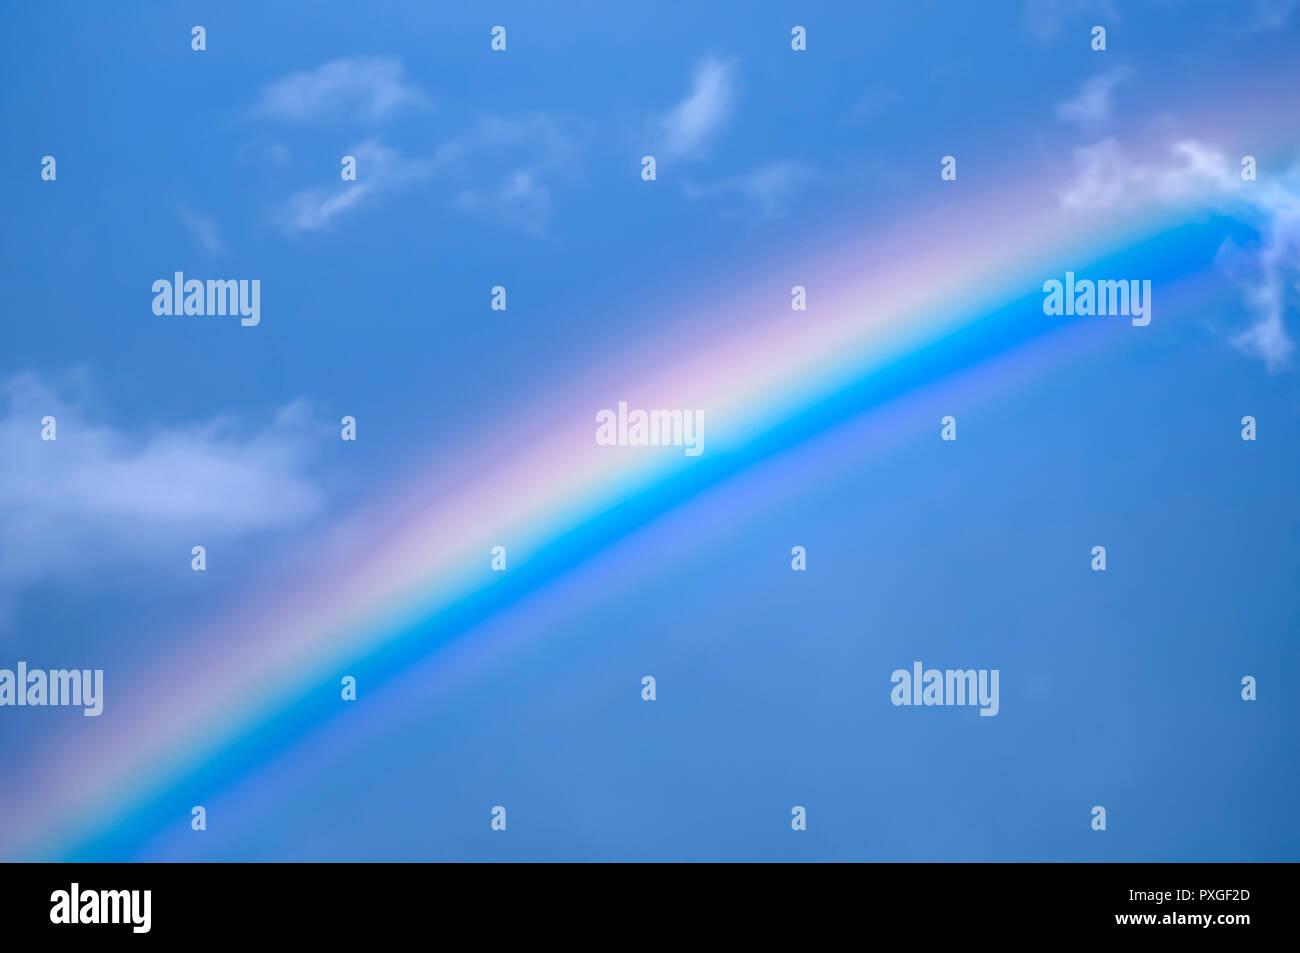 Rainbow on blue sky background - Stock Image